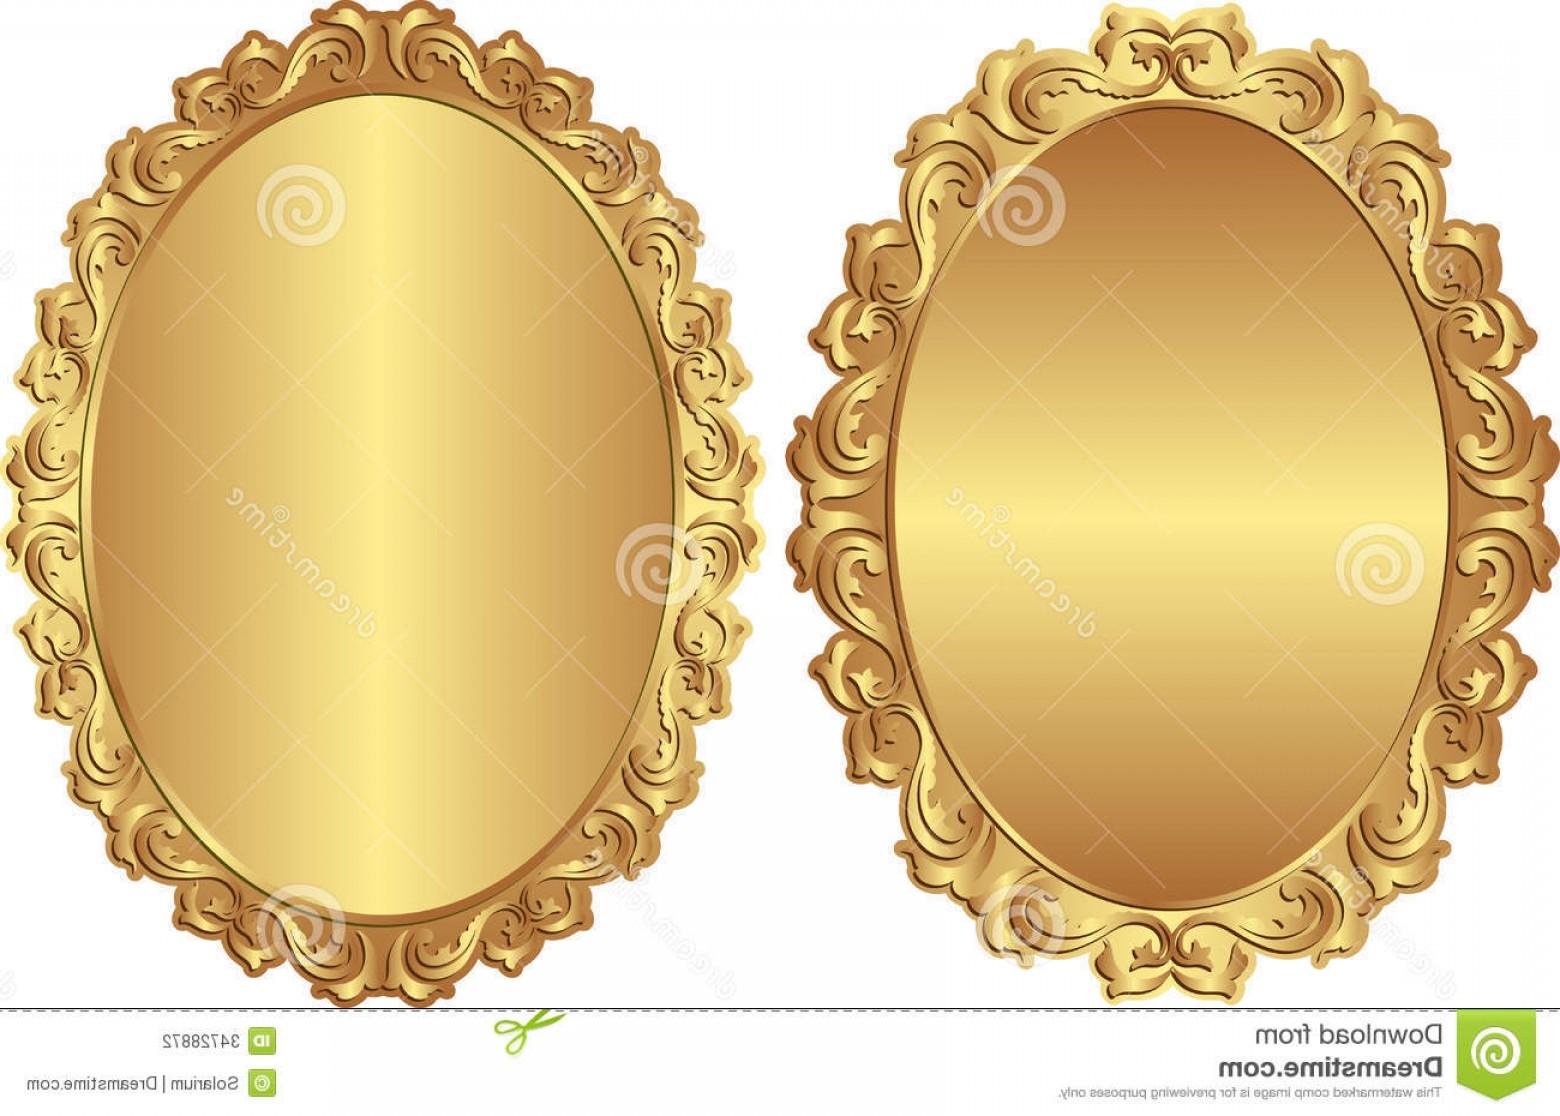 1560x1116 Stock Photography Vintage Frames Golden Vector Illustration Image